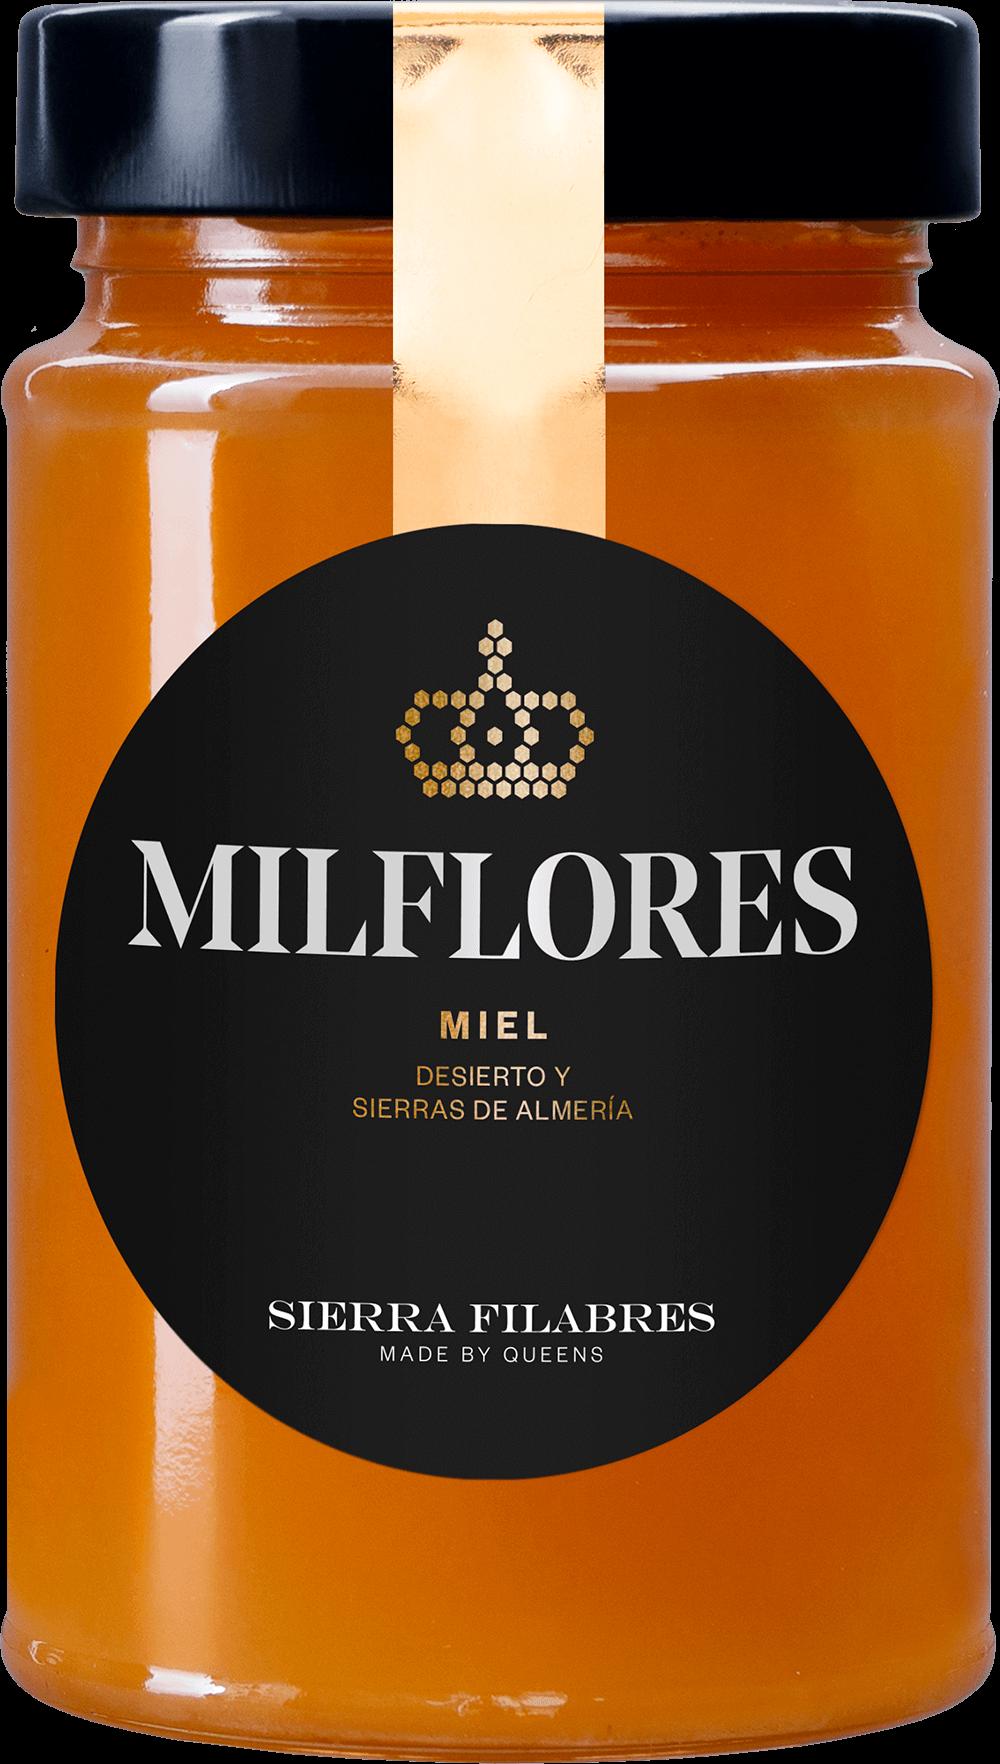 miel-clasica-milflores